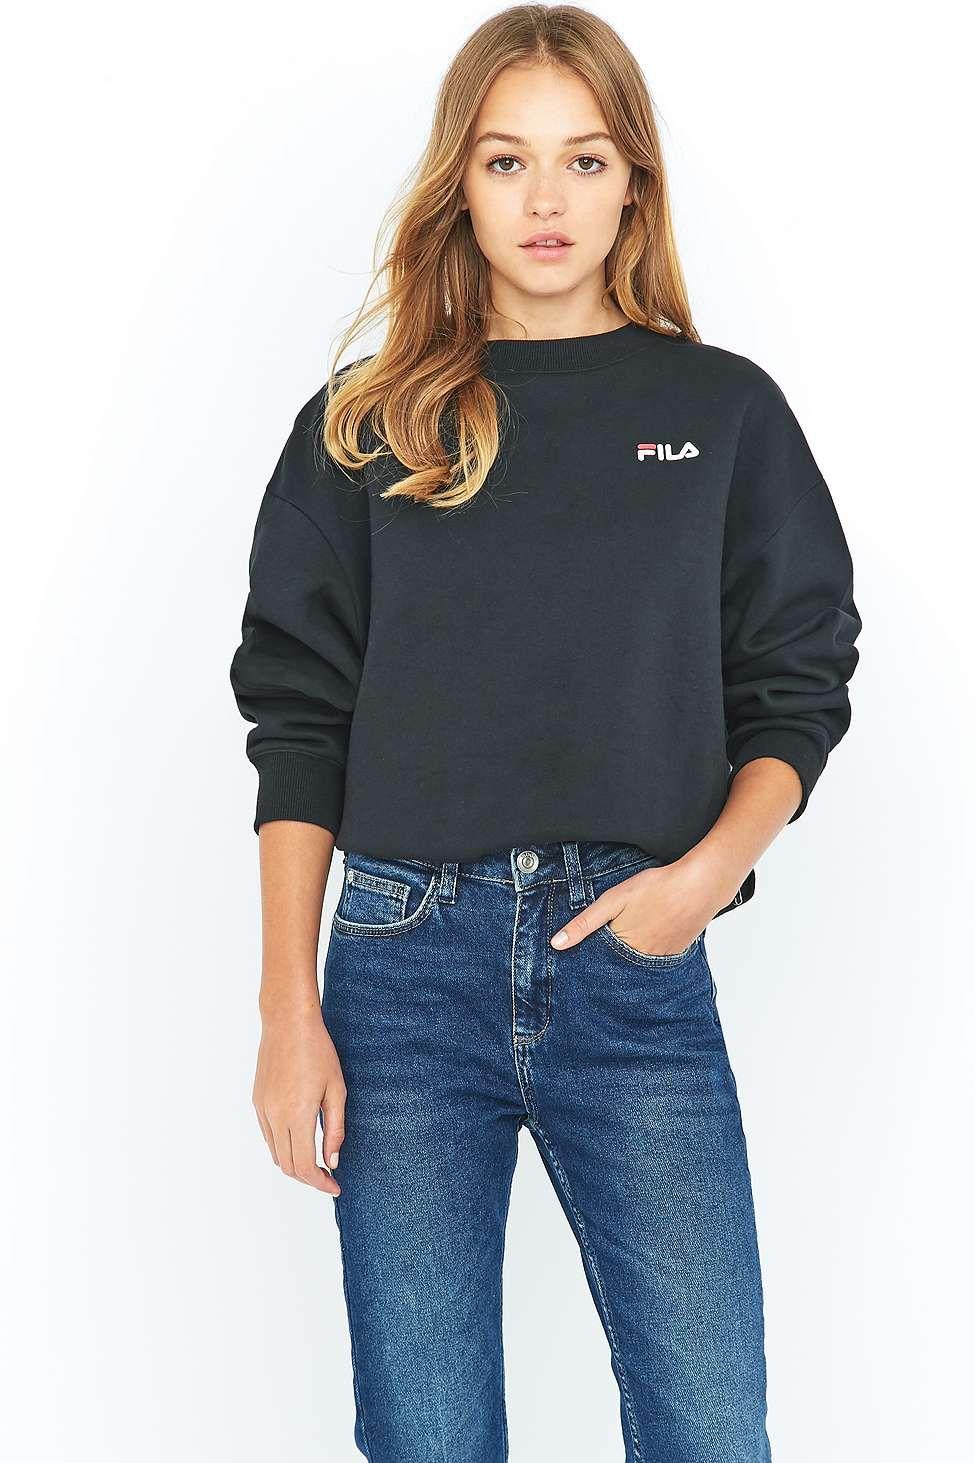 6150c00b Fila Cassio Black Crew Neck Sweatshirt | Stuff to Buy | Sweatshirt ...